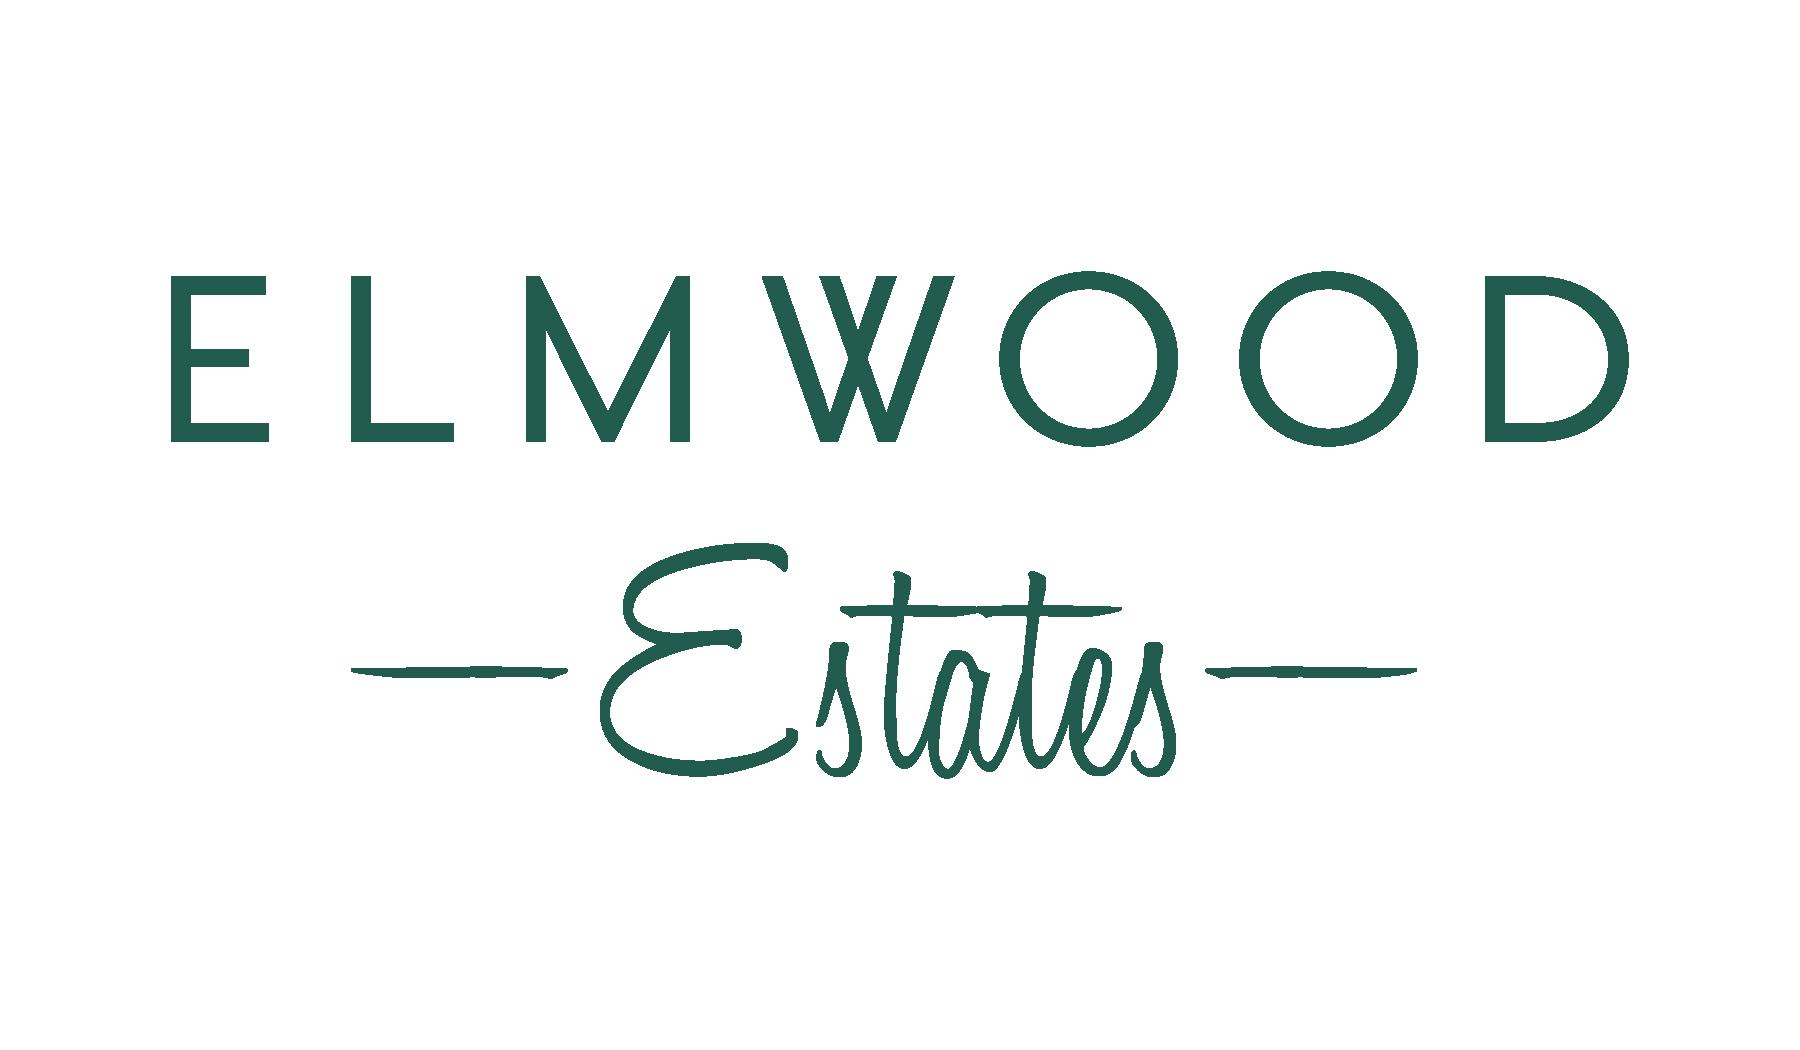 elmwoodestates-logo-color